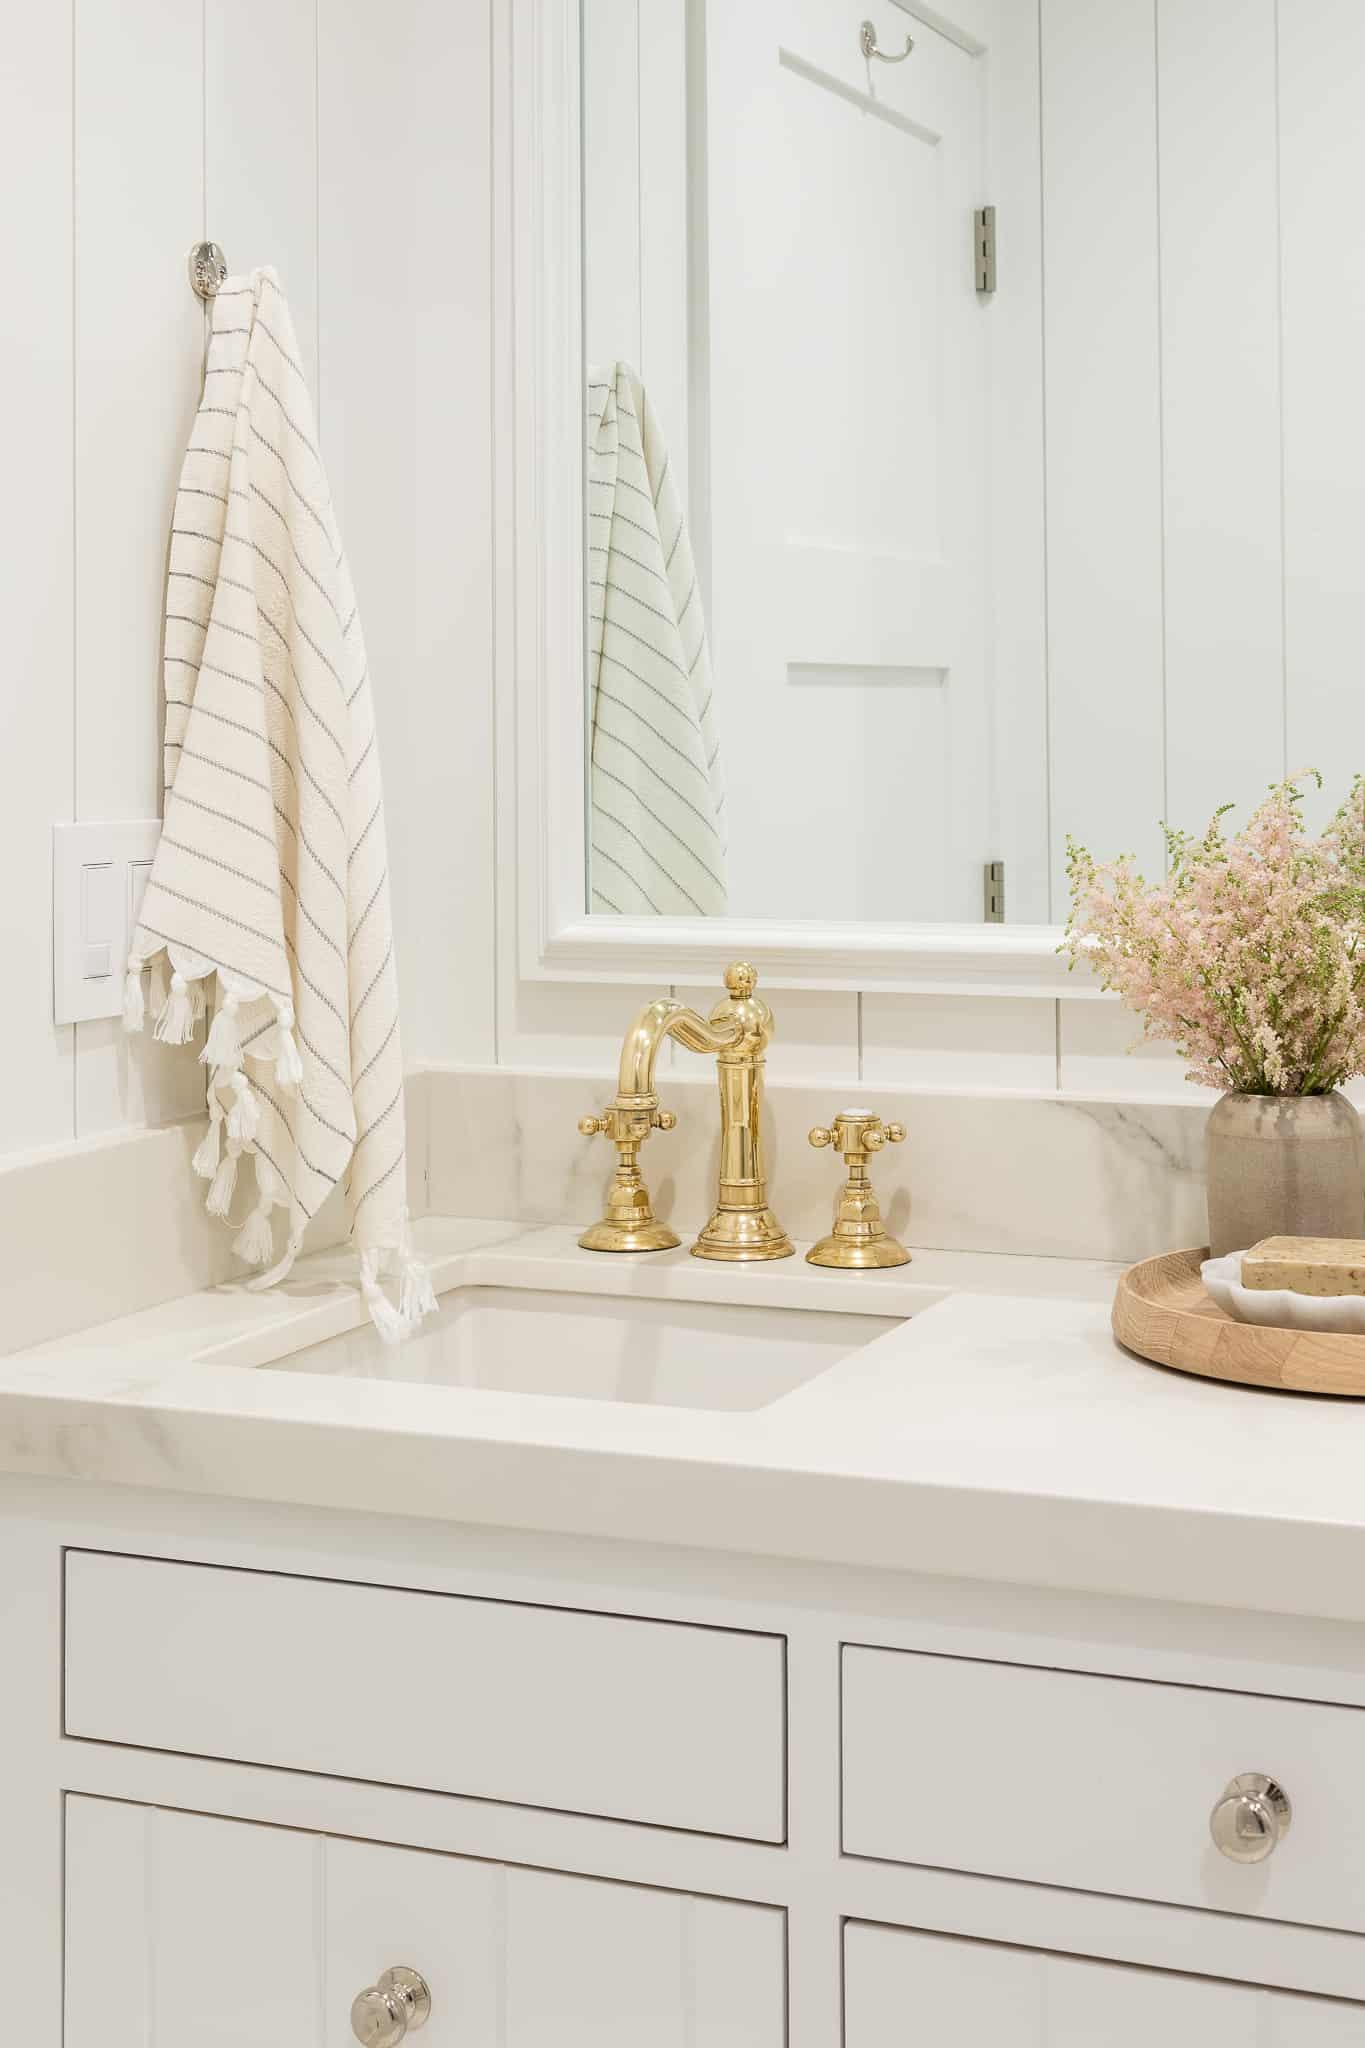 Coastal Girls Bathroom Design - Port Newport Project - Mindy Gayer Design Co.